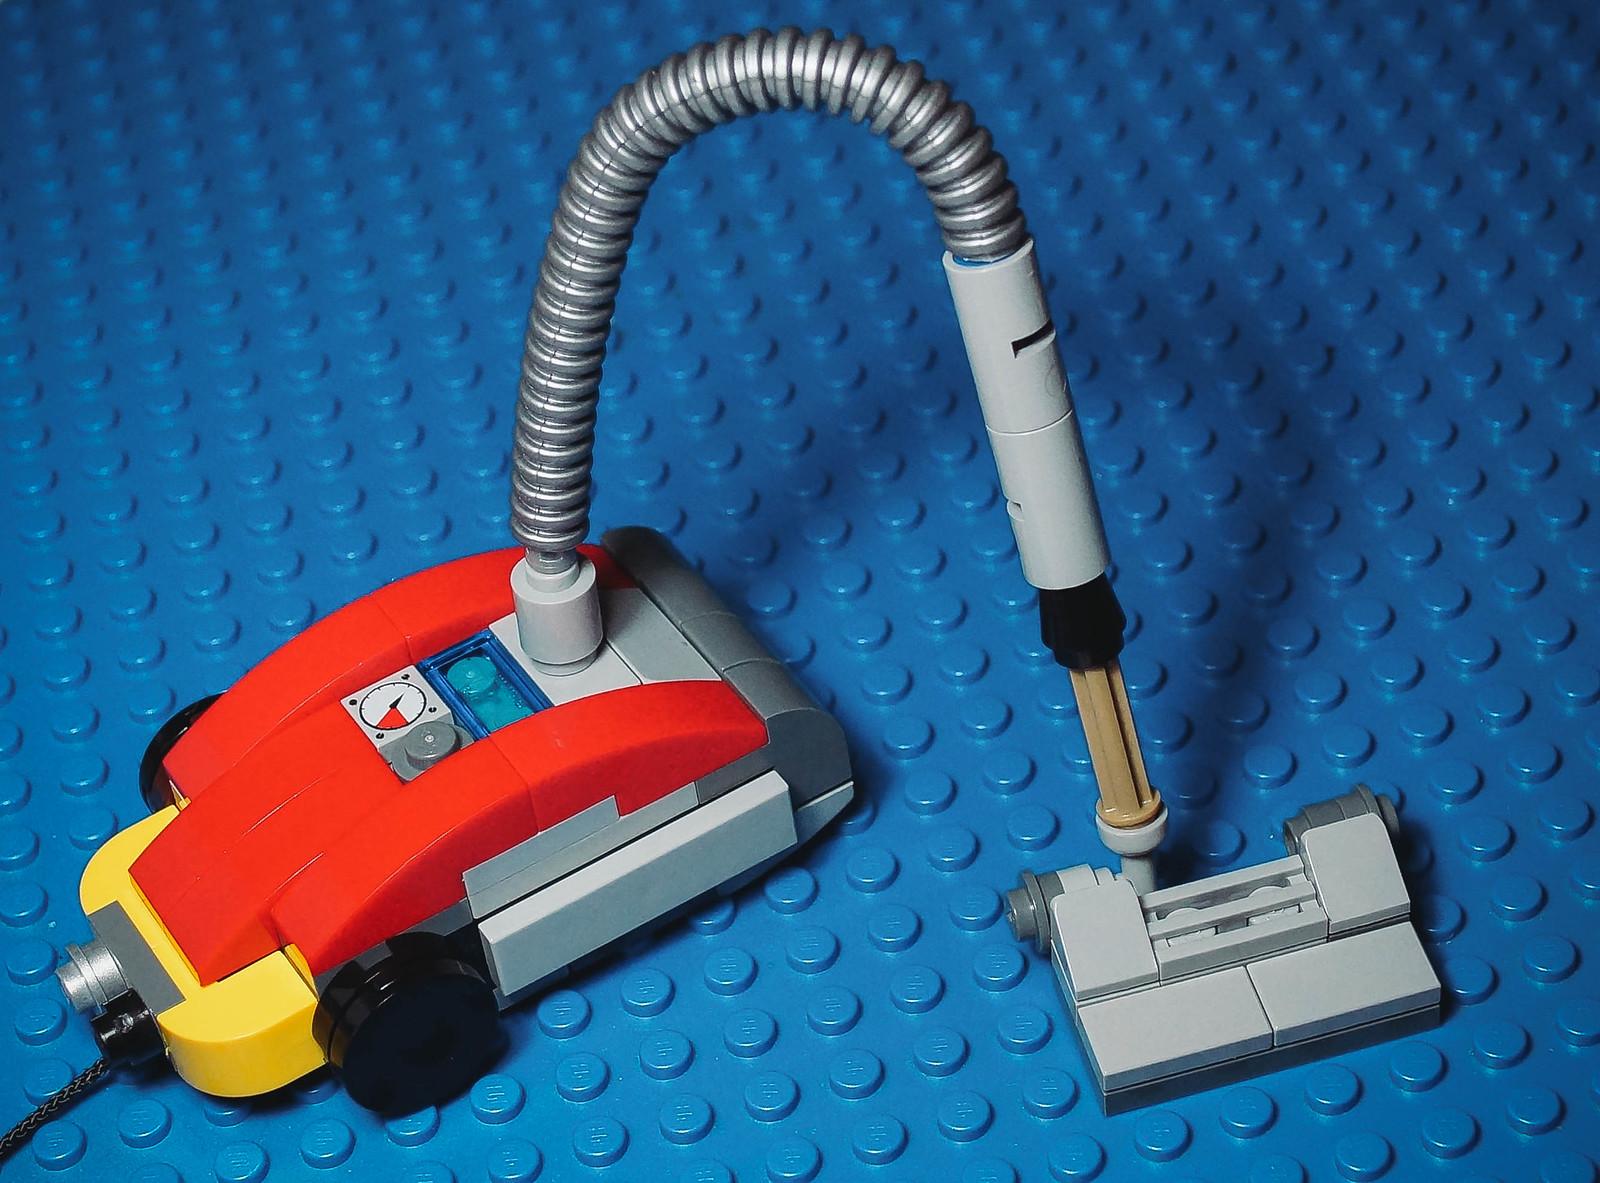 Lego Mini Vac Cleaner Special Lego Themes Eurobricks